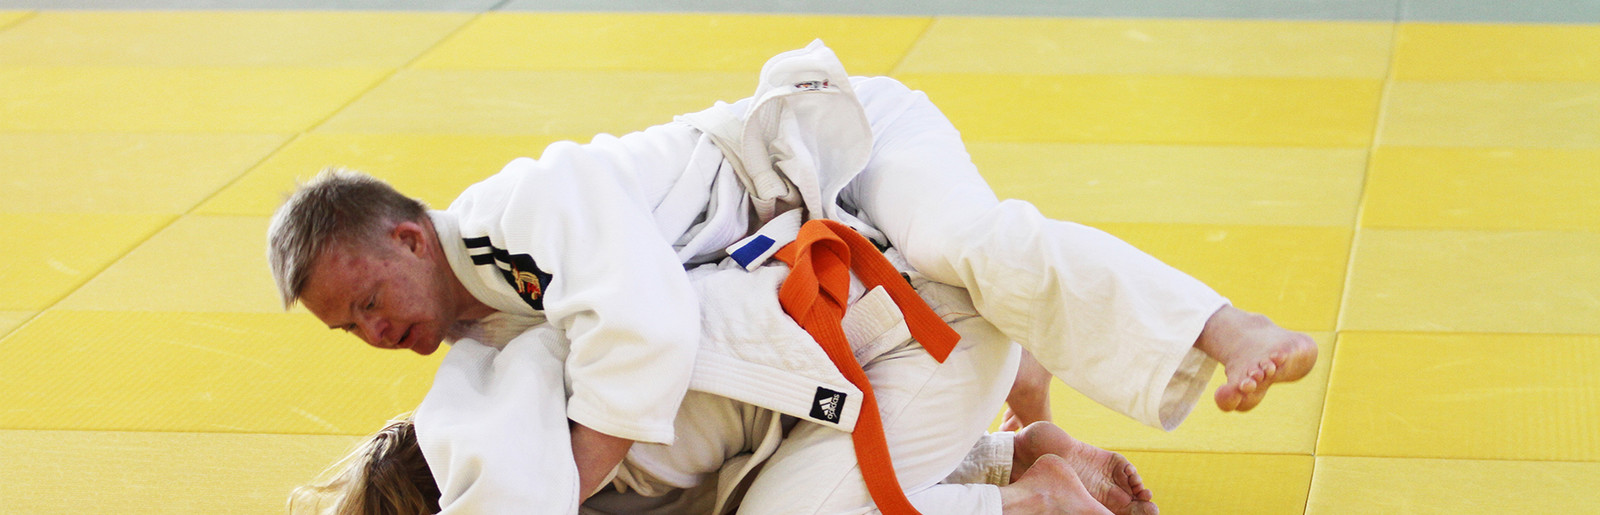 Otsikkokuva aiheesta Judo